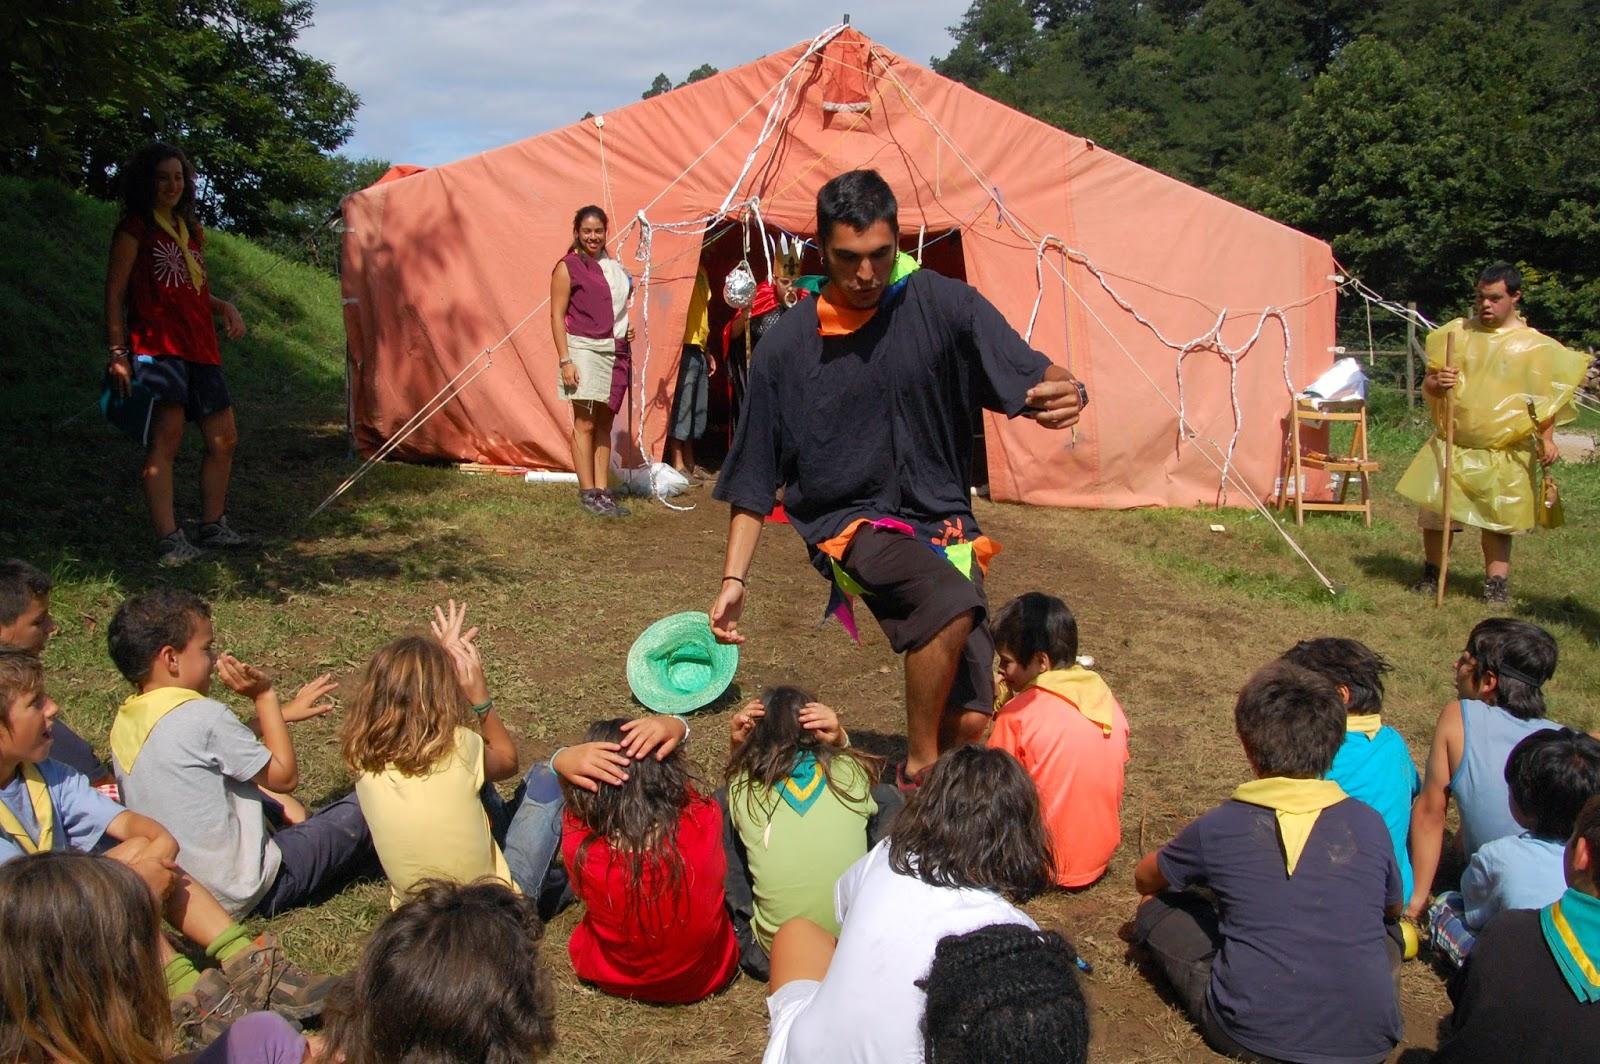 Campaments Estiu RolandKing 2011 - DSC_0179.JPG